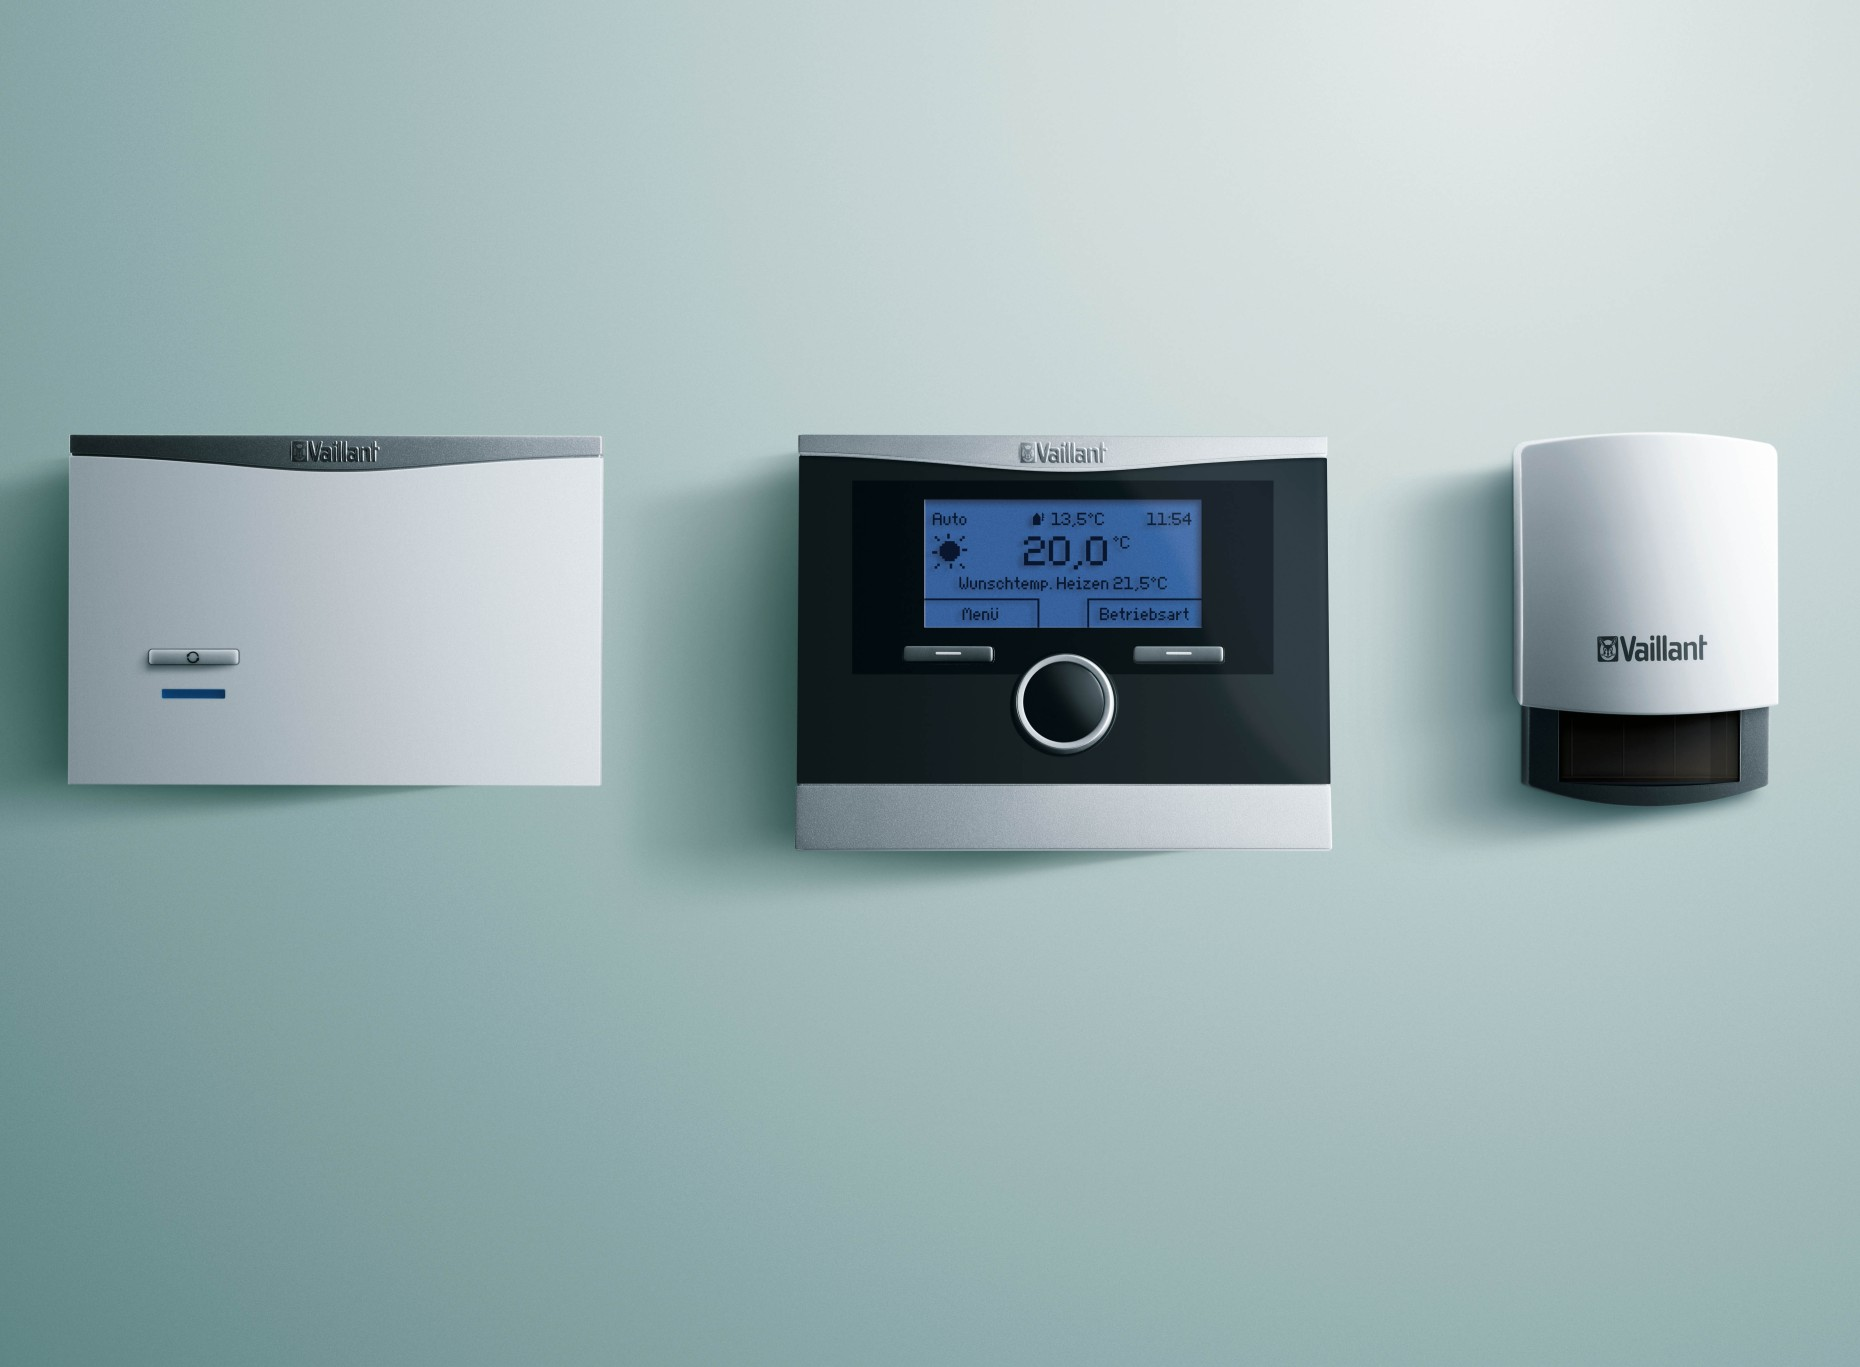 calormatic 470 atmosferski regulator vaillant. Black Bedroom Furniture Sets. Home Design Ideas